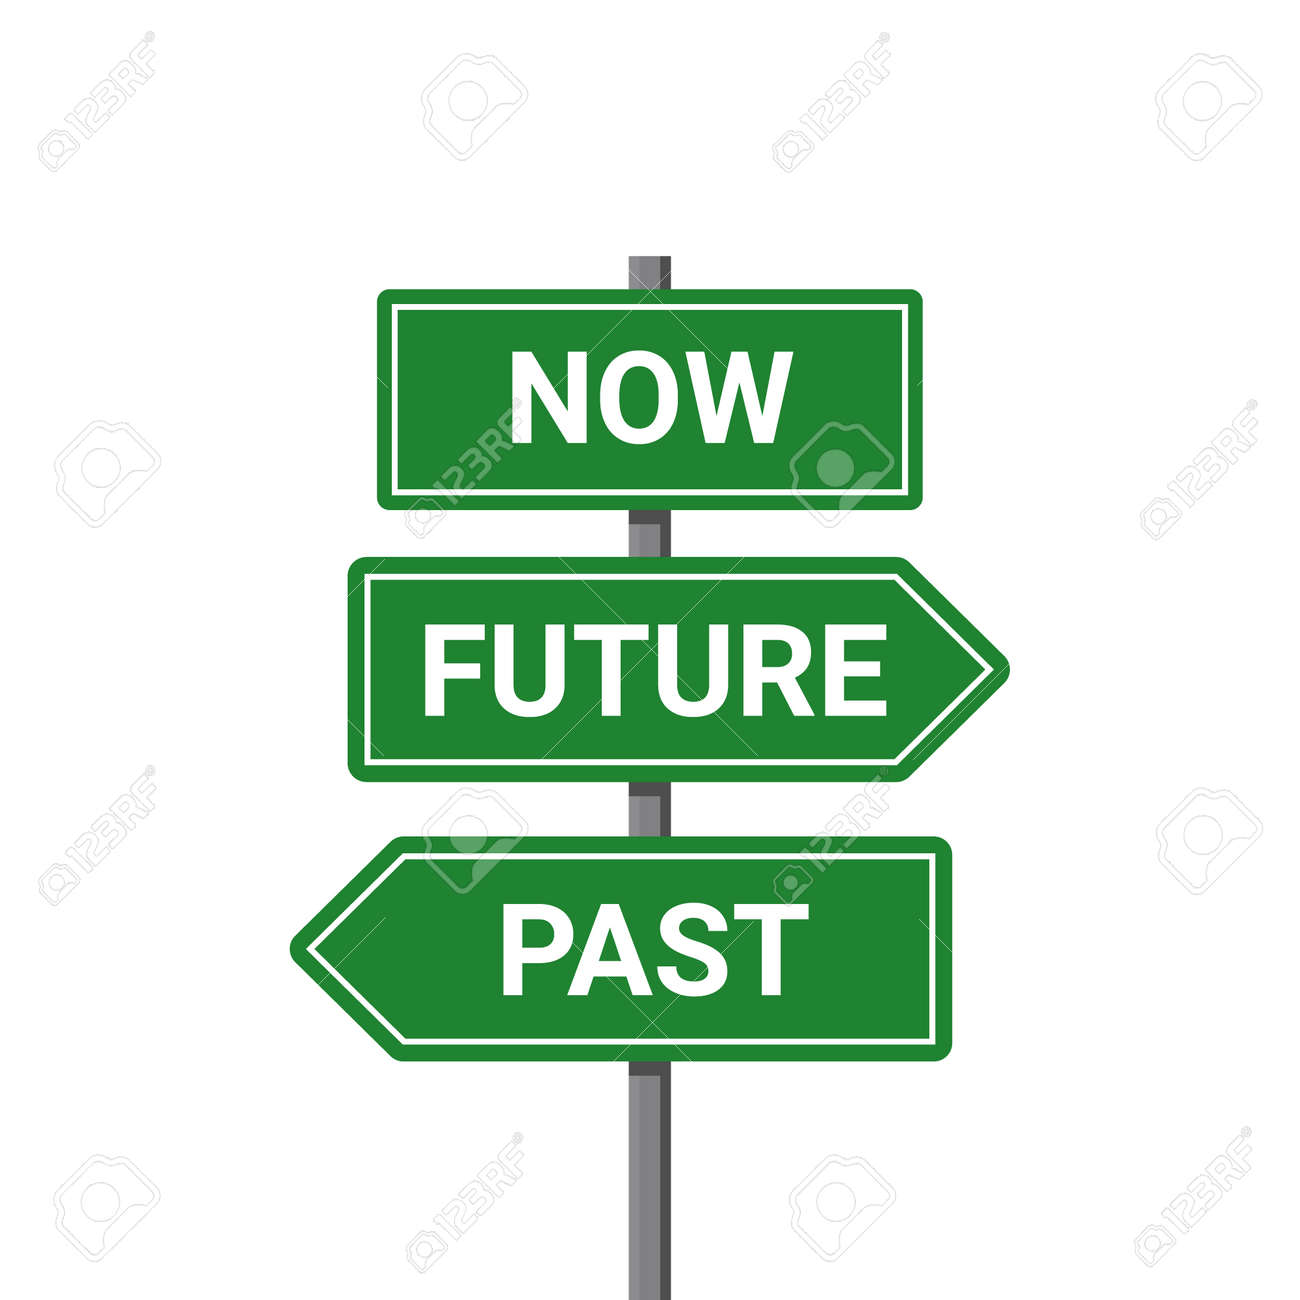 Future past present board icon. Now pas and future way destiny sign - 165234197